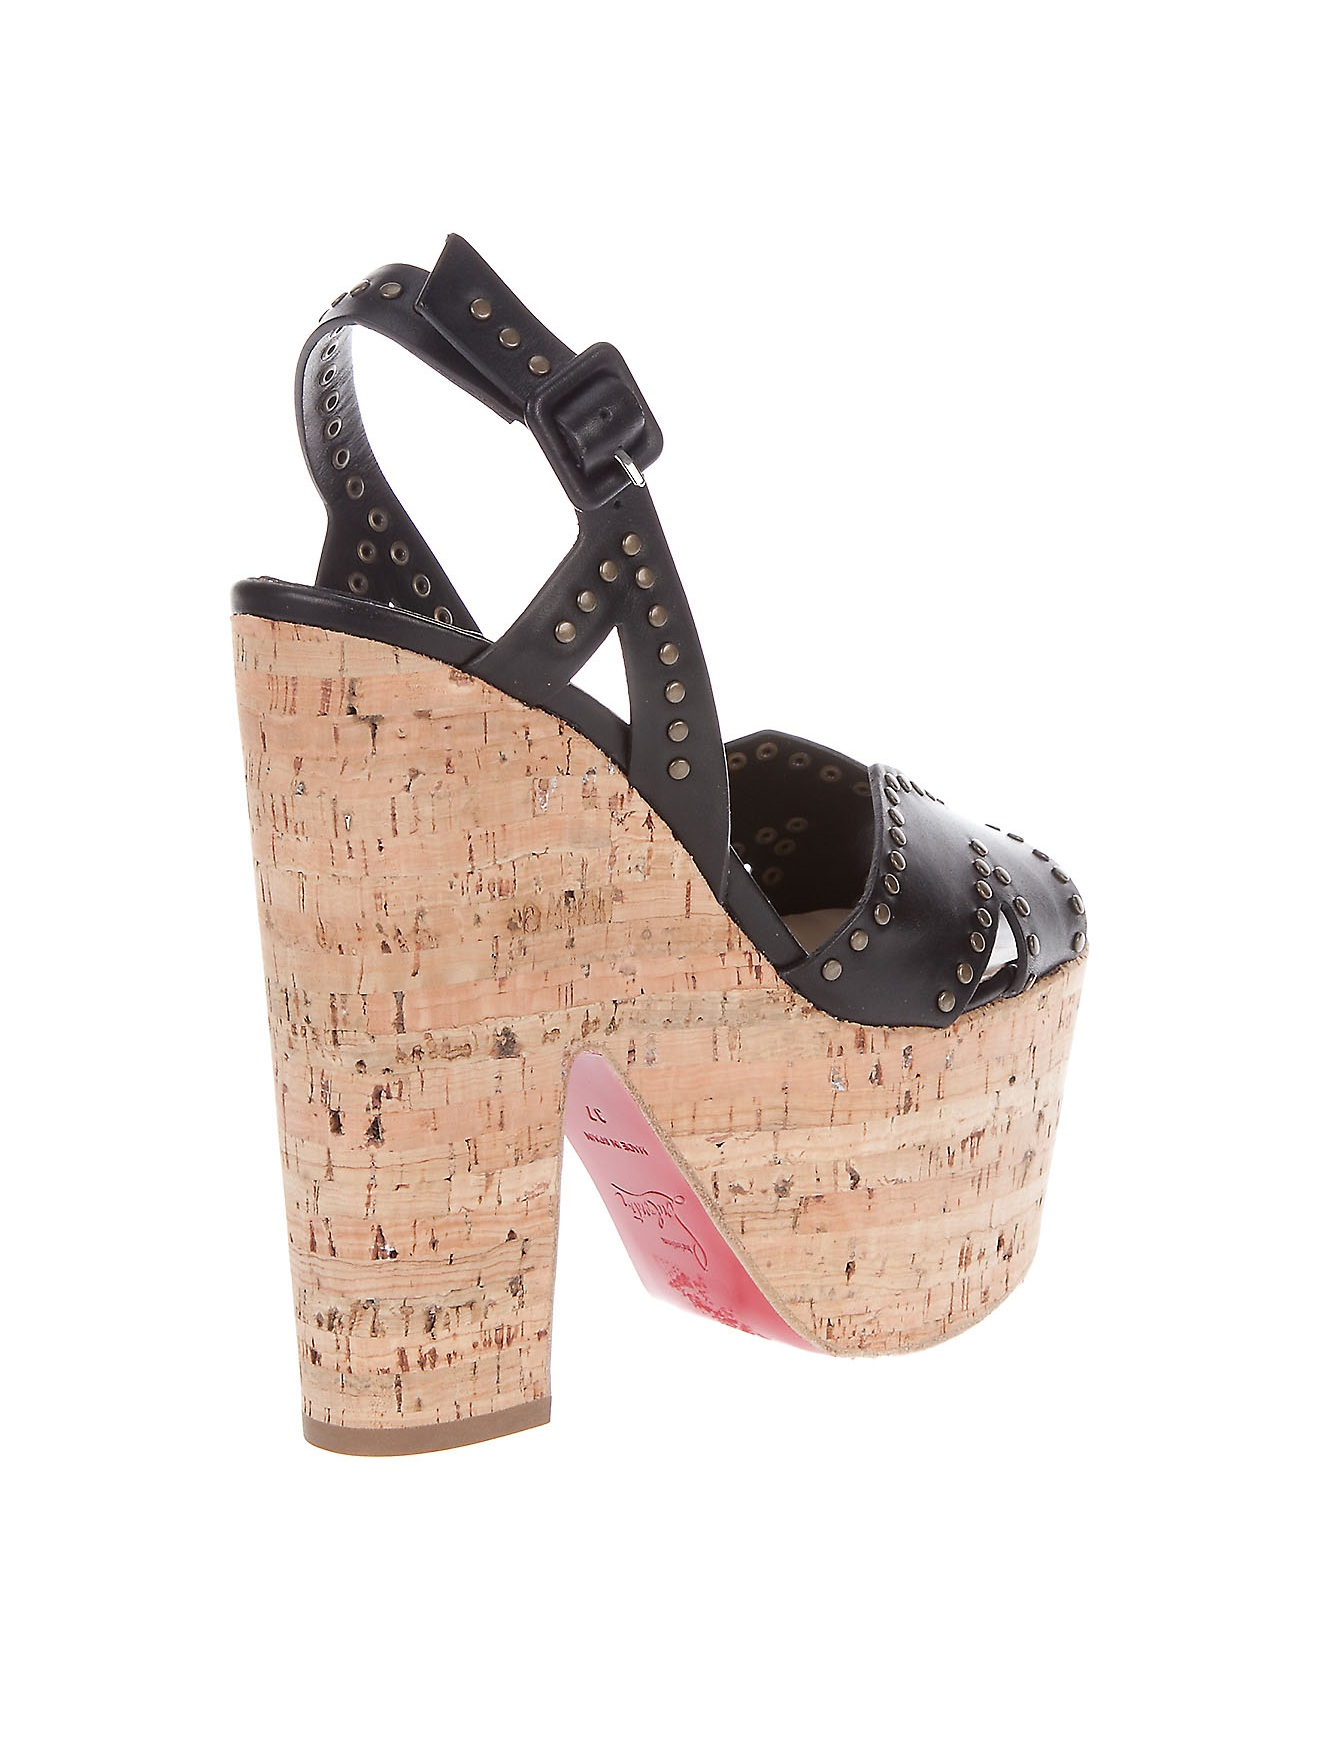 christian louboutin replicas - christian louboutin cork platform sandals - Bavilon Salon